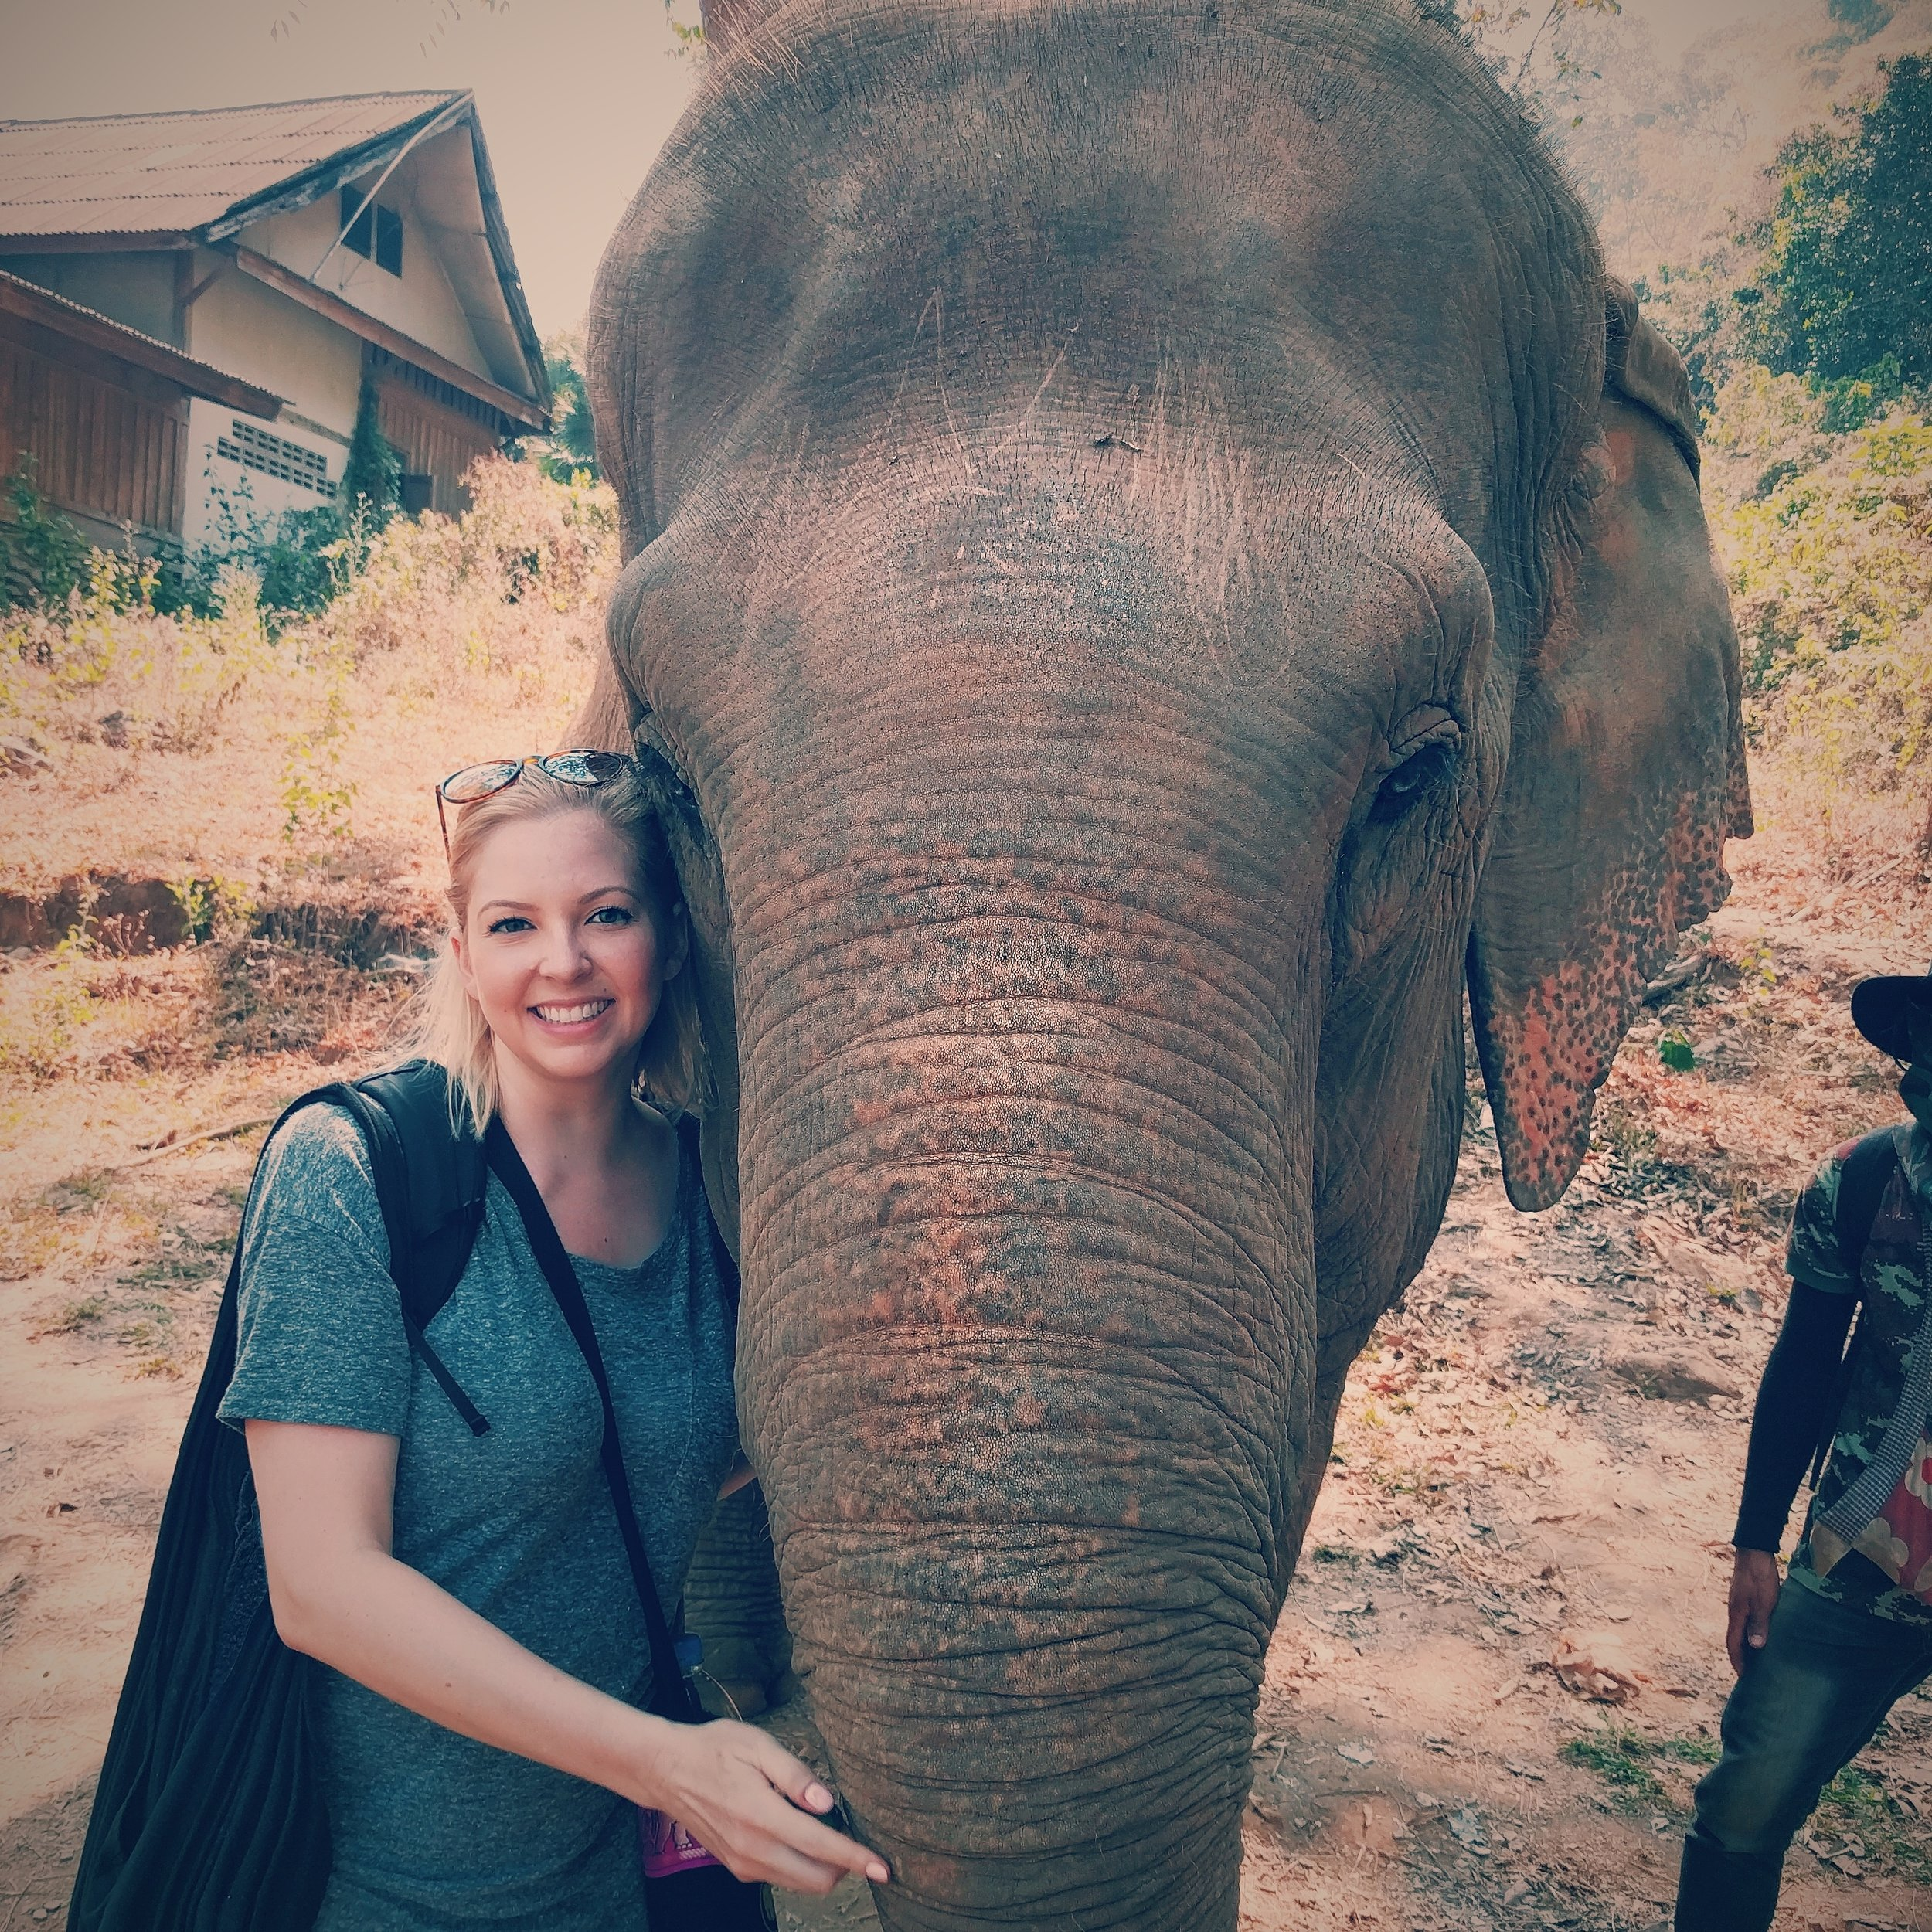 Hugging elephants in Elephant Nature Park